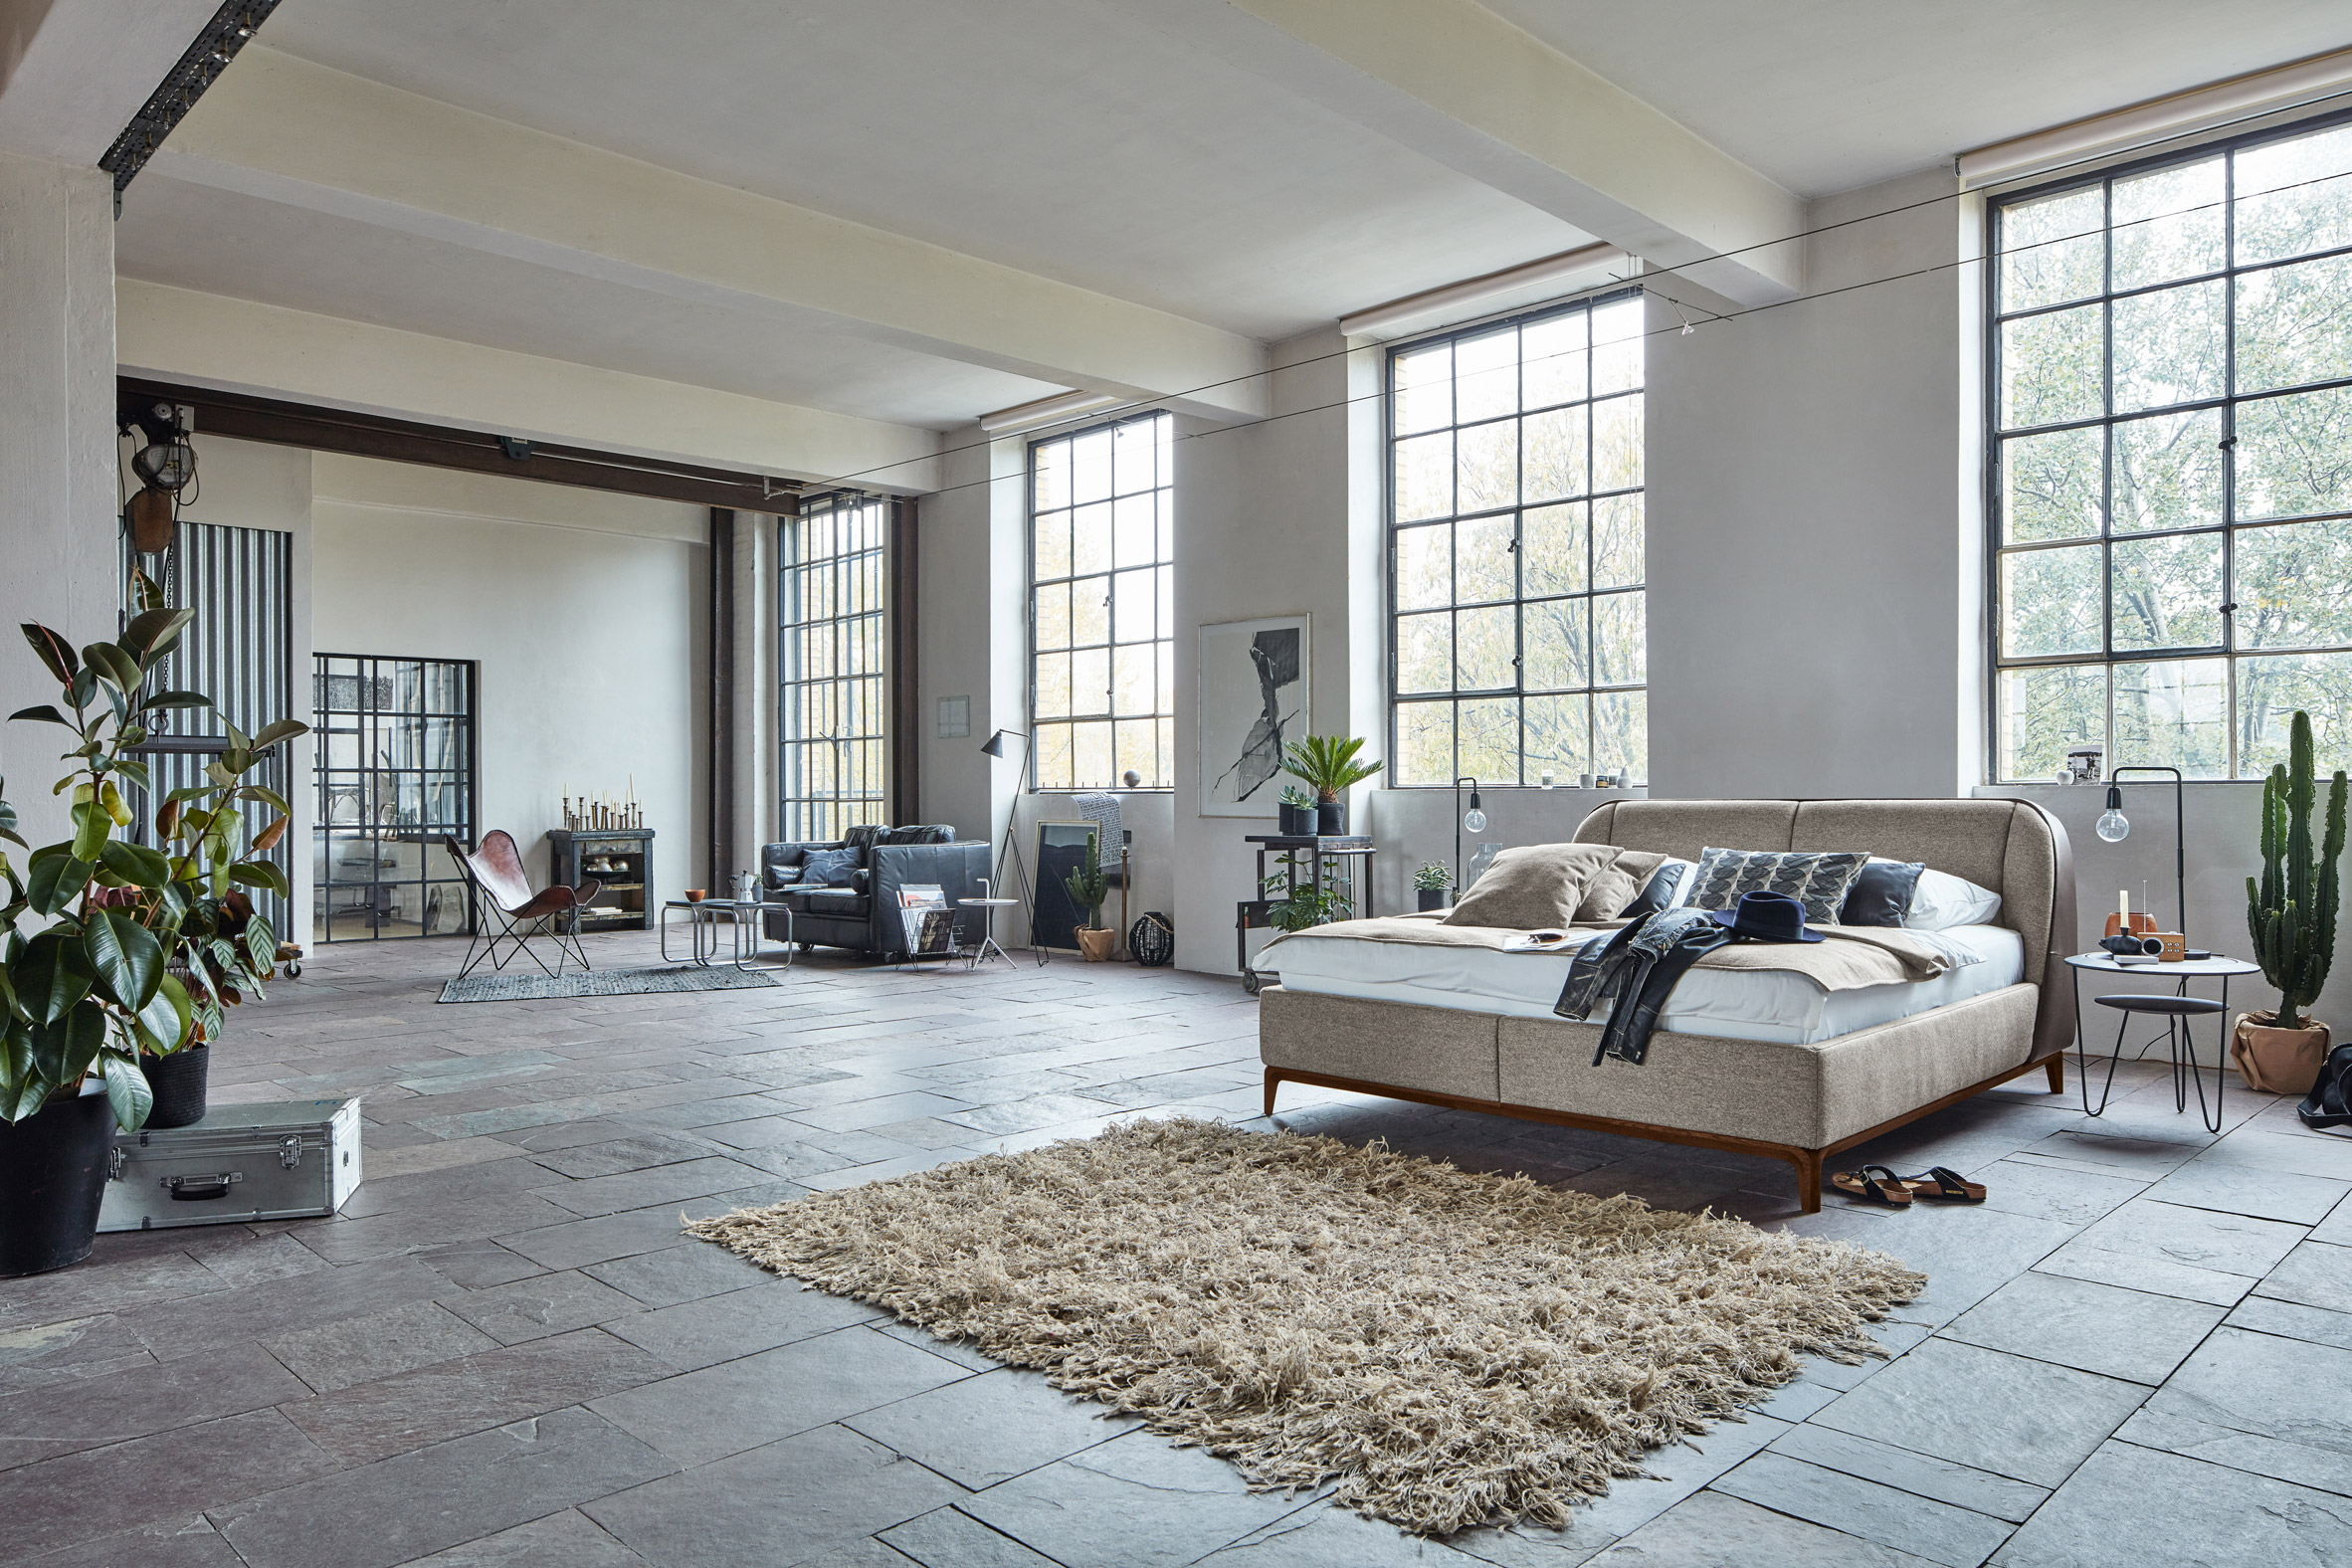 imm-cologne-2017-design-furniture-beds-birkenstock_dezeen_2364_col_7